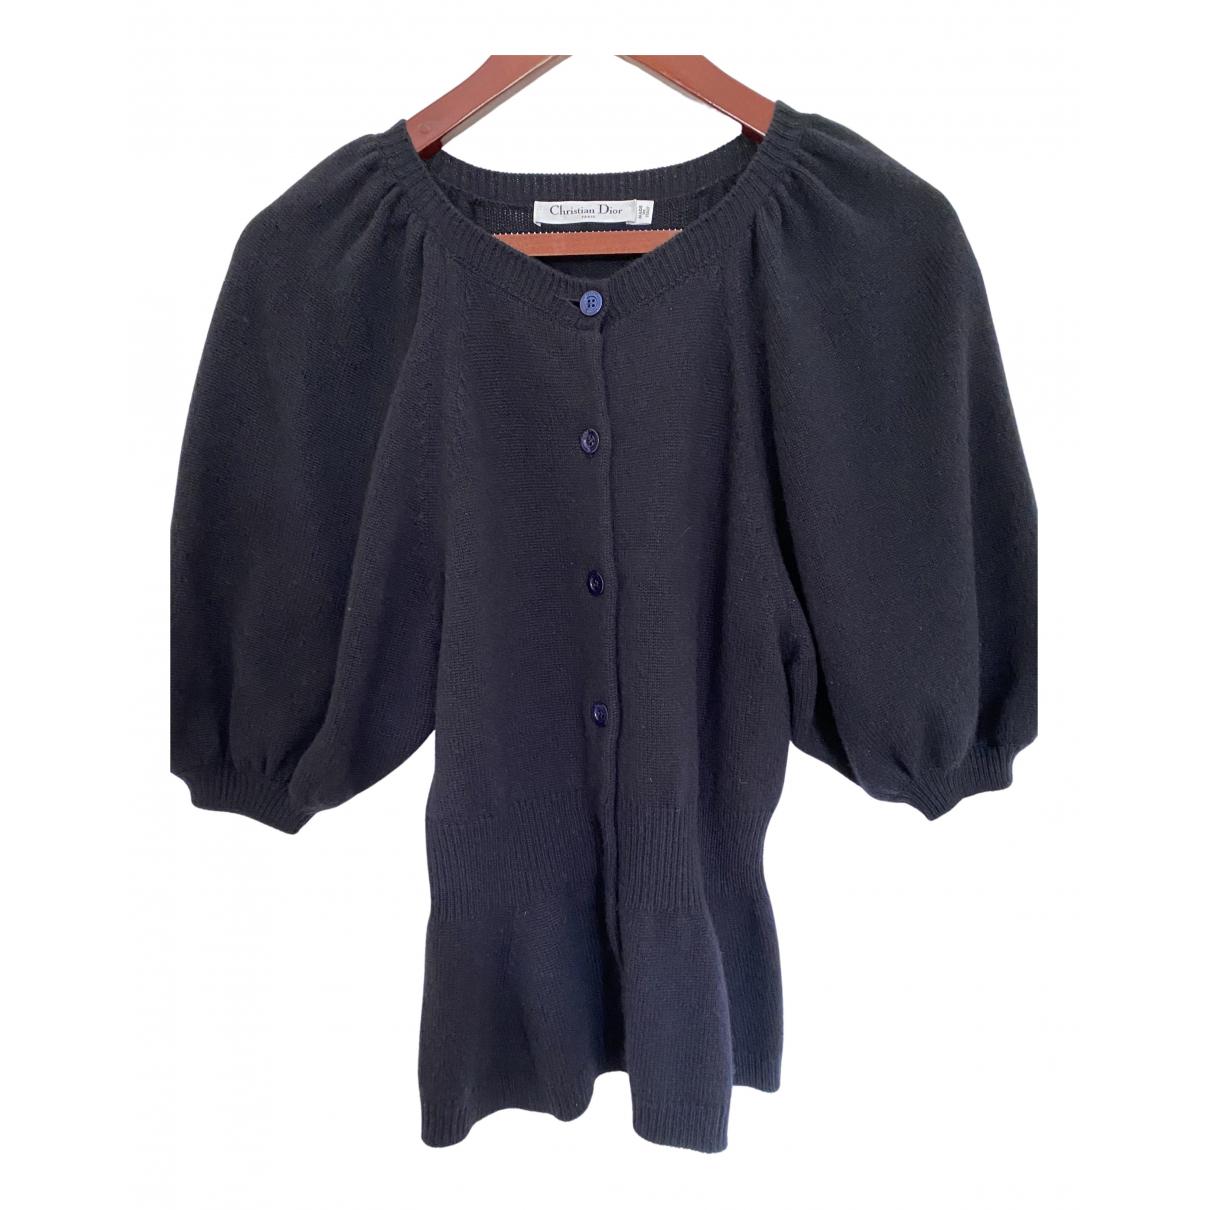 Dior N Navy Cashmere Knitwear for Women 36 FR